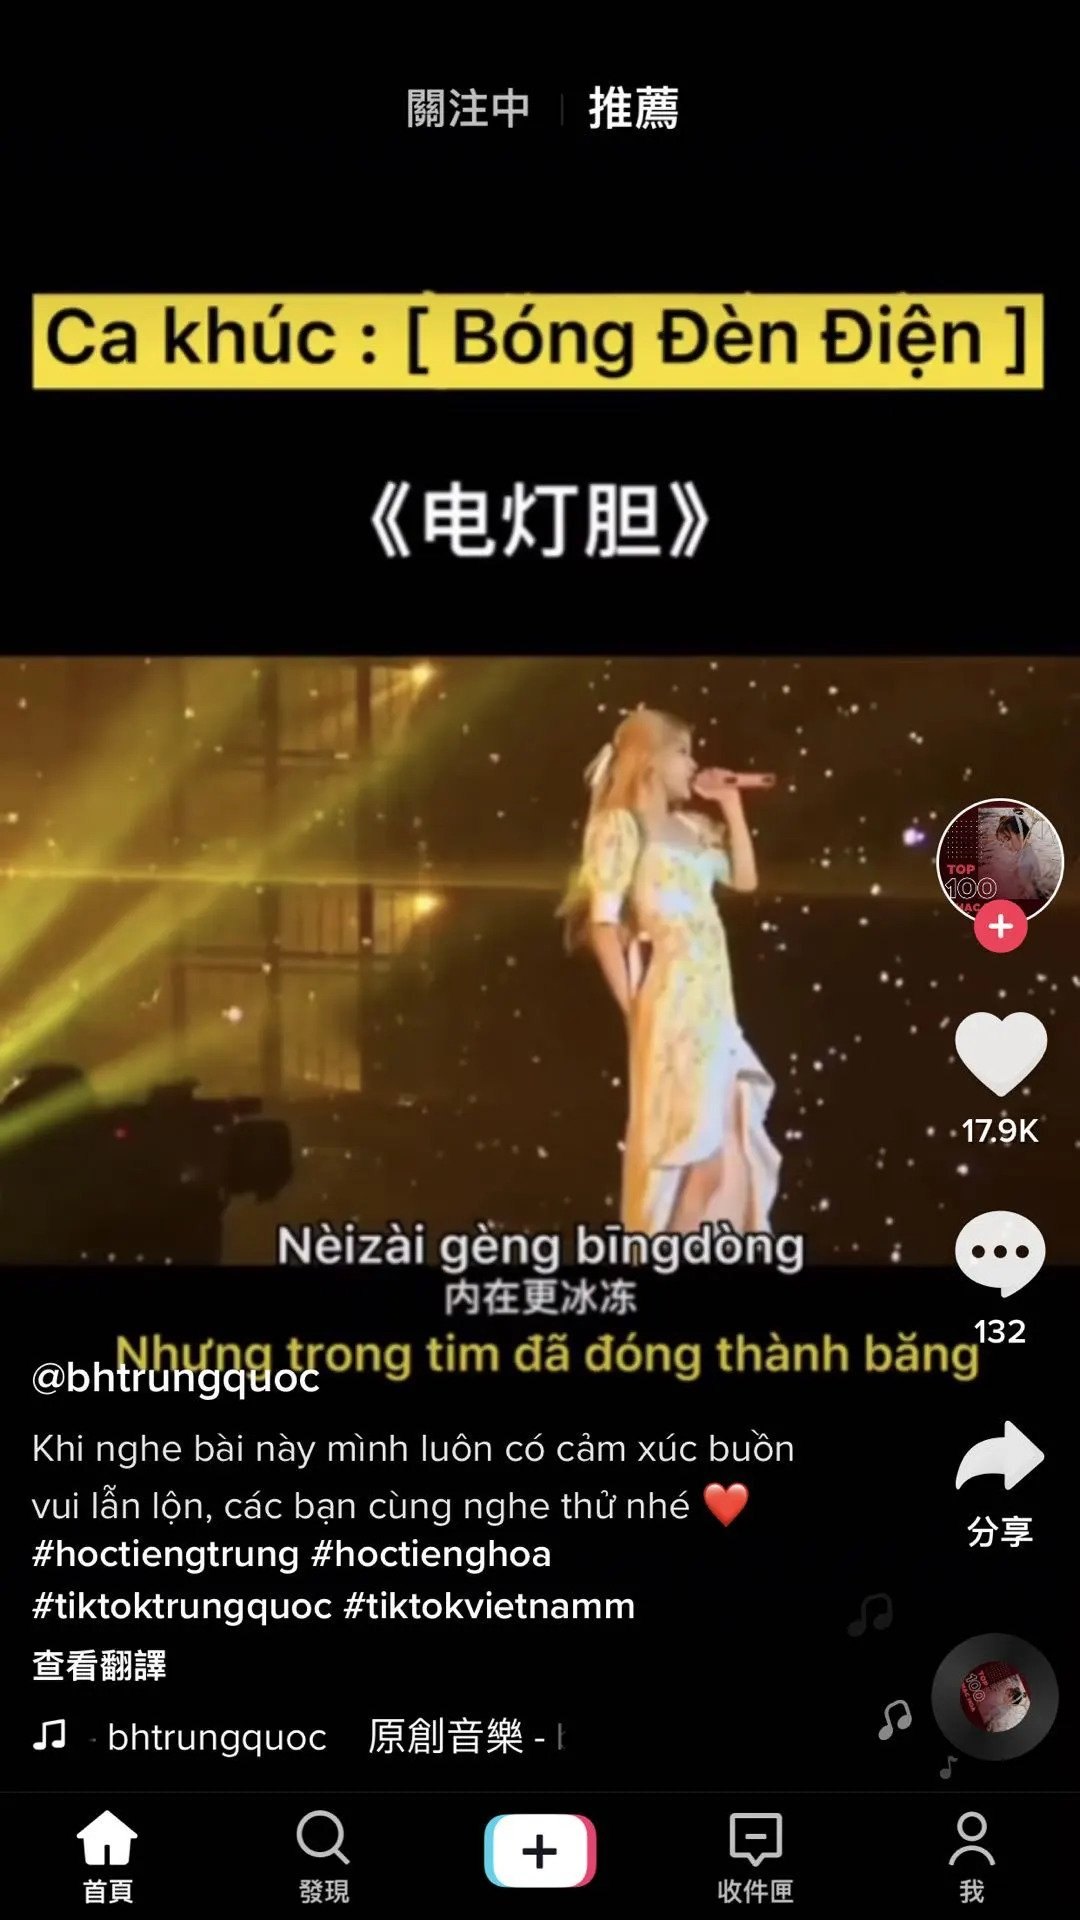 抖音国际版-Android&IOS 无蔷 免翻 无限制 秒播...